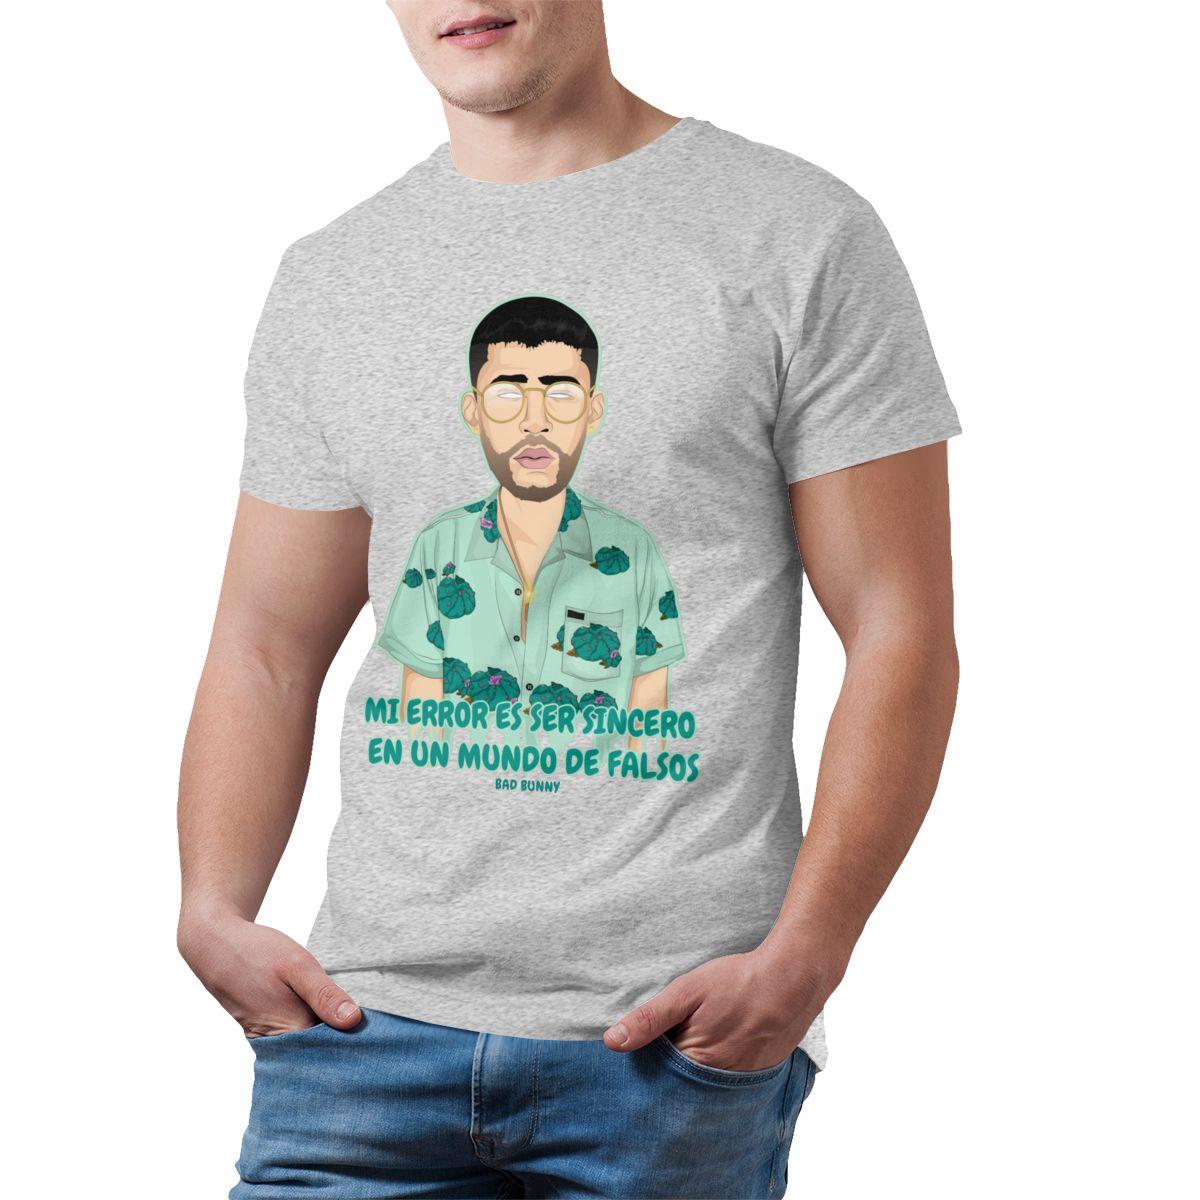 bad bunny short sleeve oversized t shirt bbm0108 6734 - Bad Bunny Store